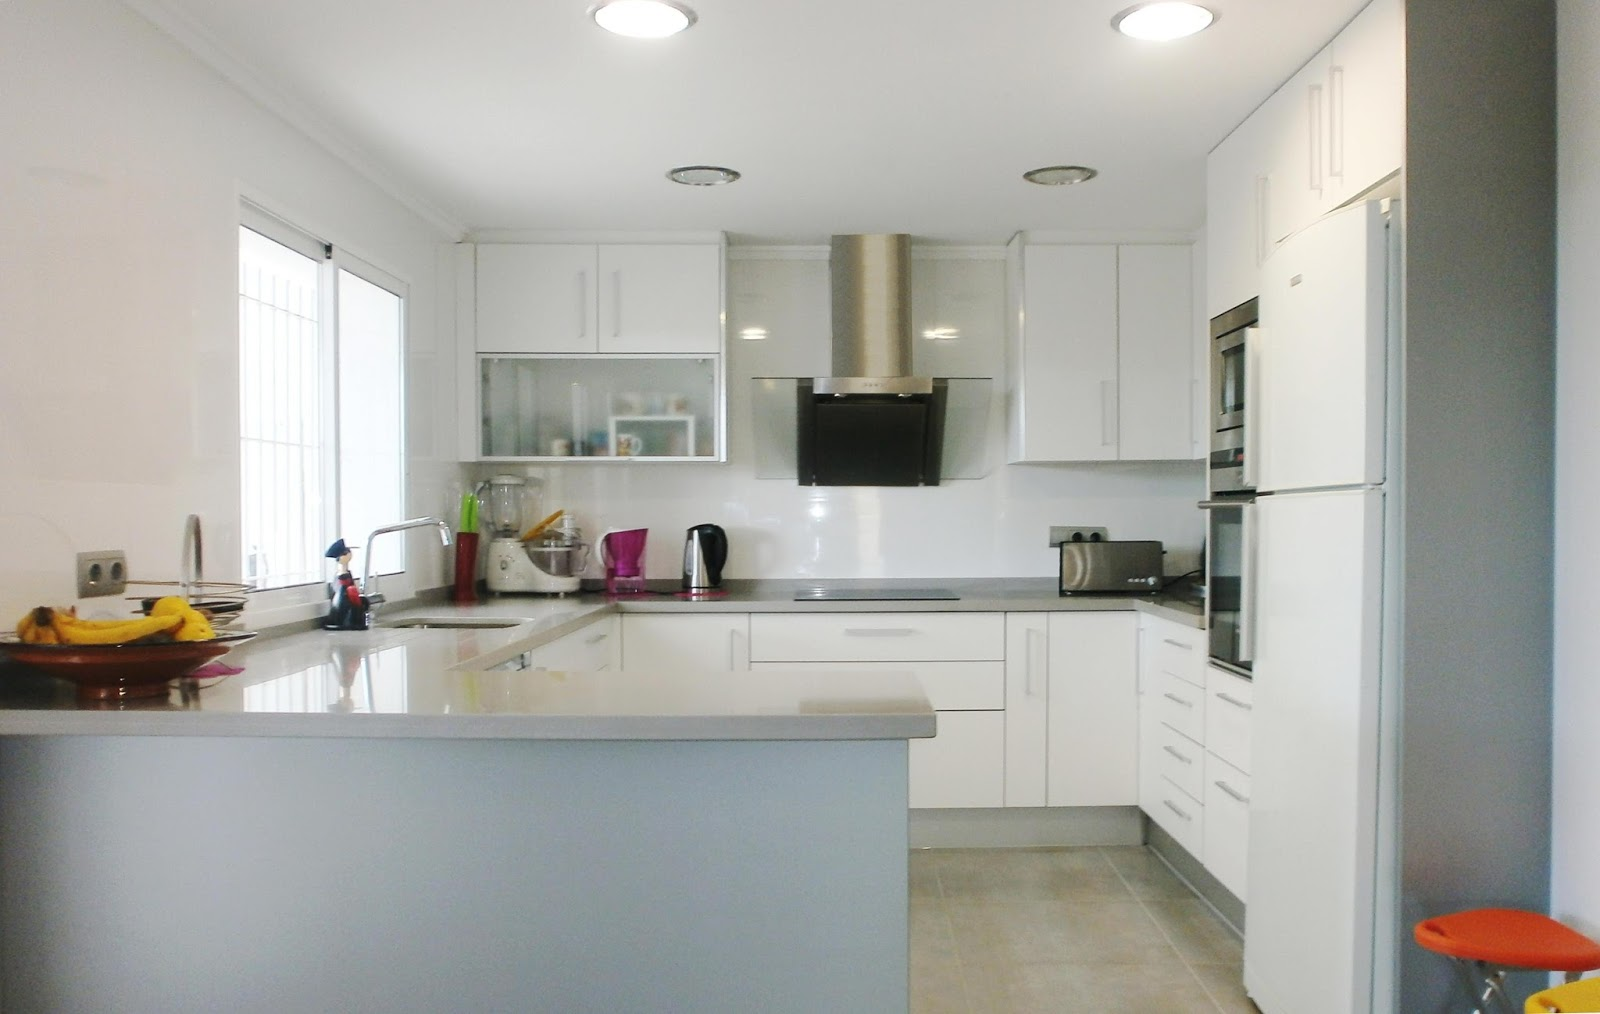 Дизайн трехкомнатной квартиры - фото